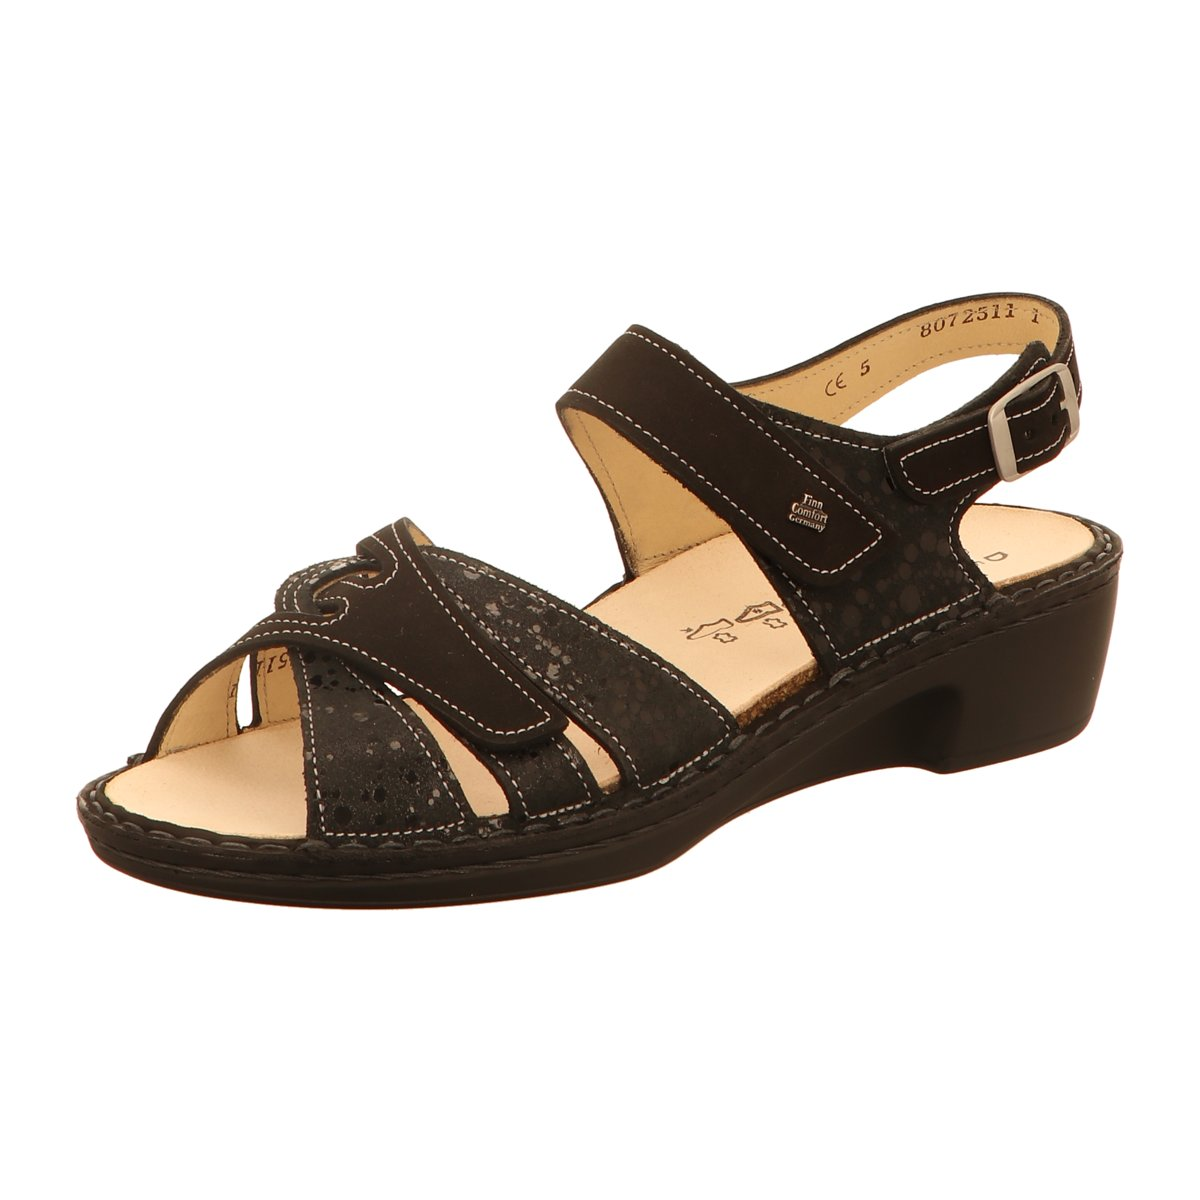 FinnComfort Damen Sandaletten BUKA 2687901672 schwarz 461110